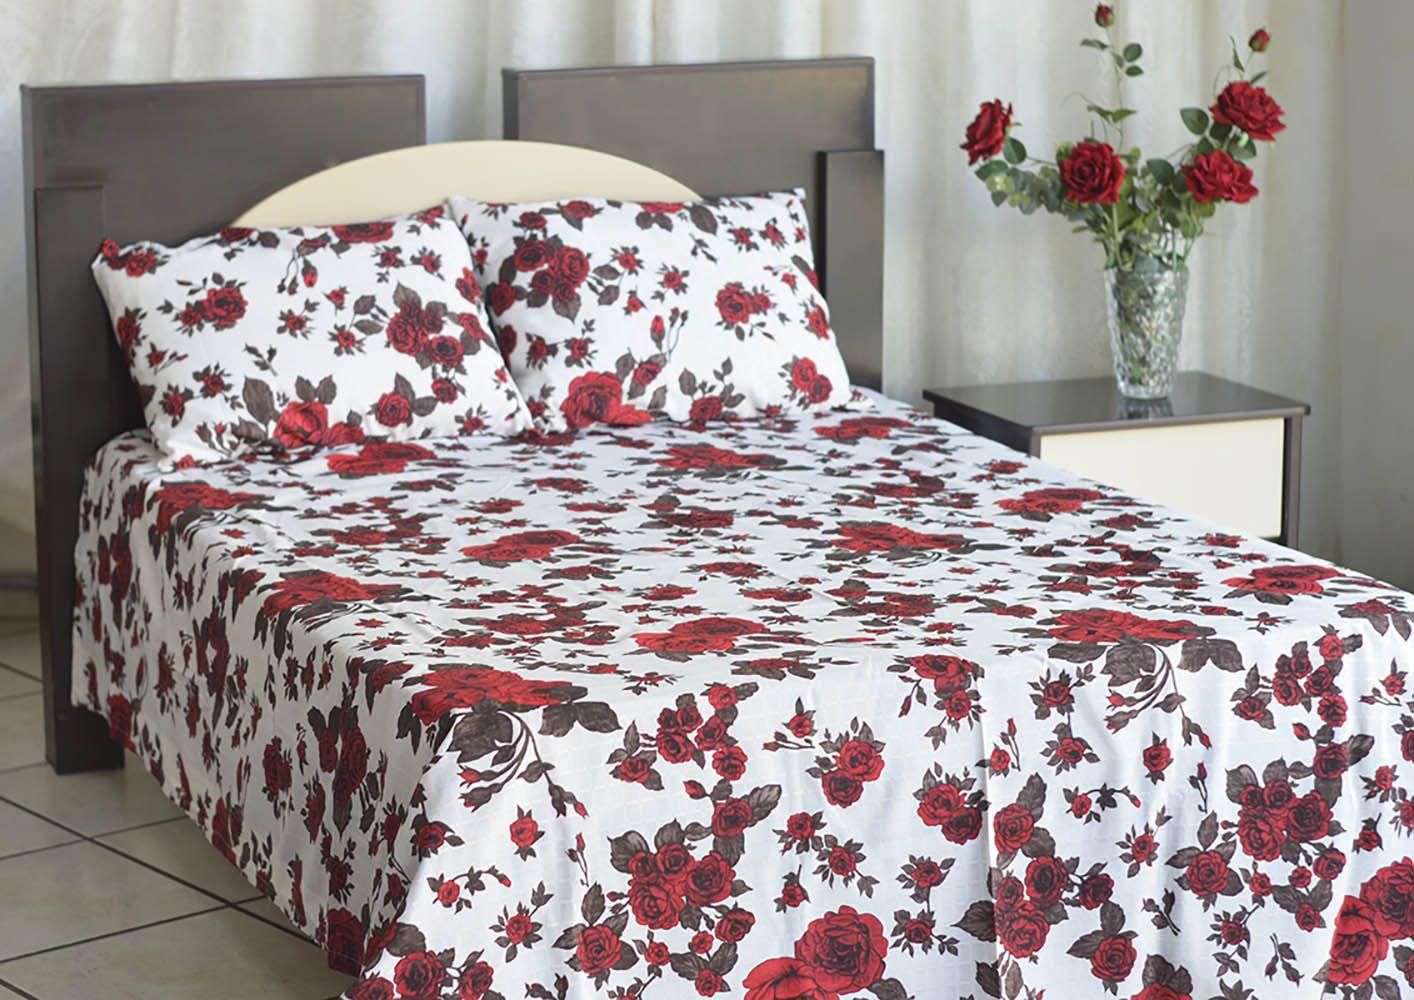 Colcha de casal texturatto estampada Rosas Vermelhas - OMA Enxovais